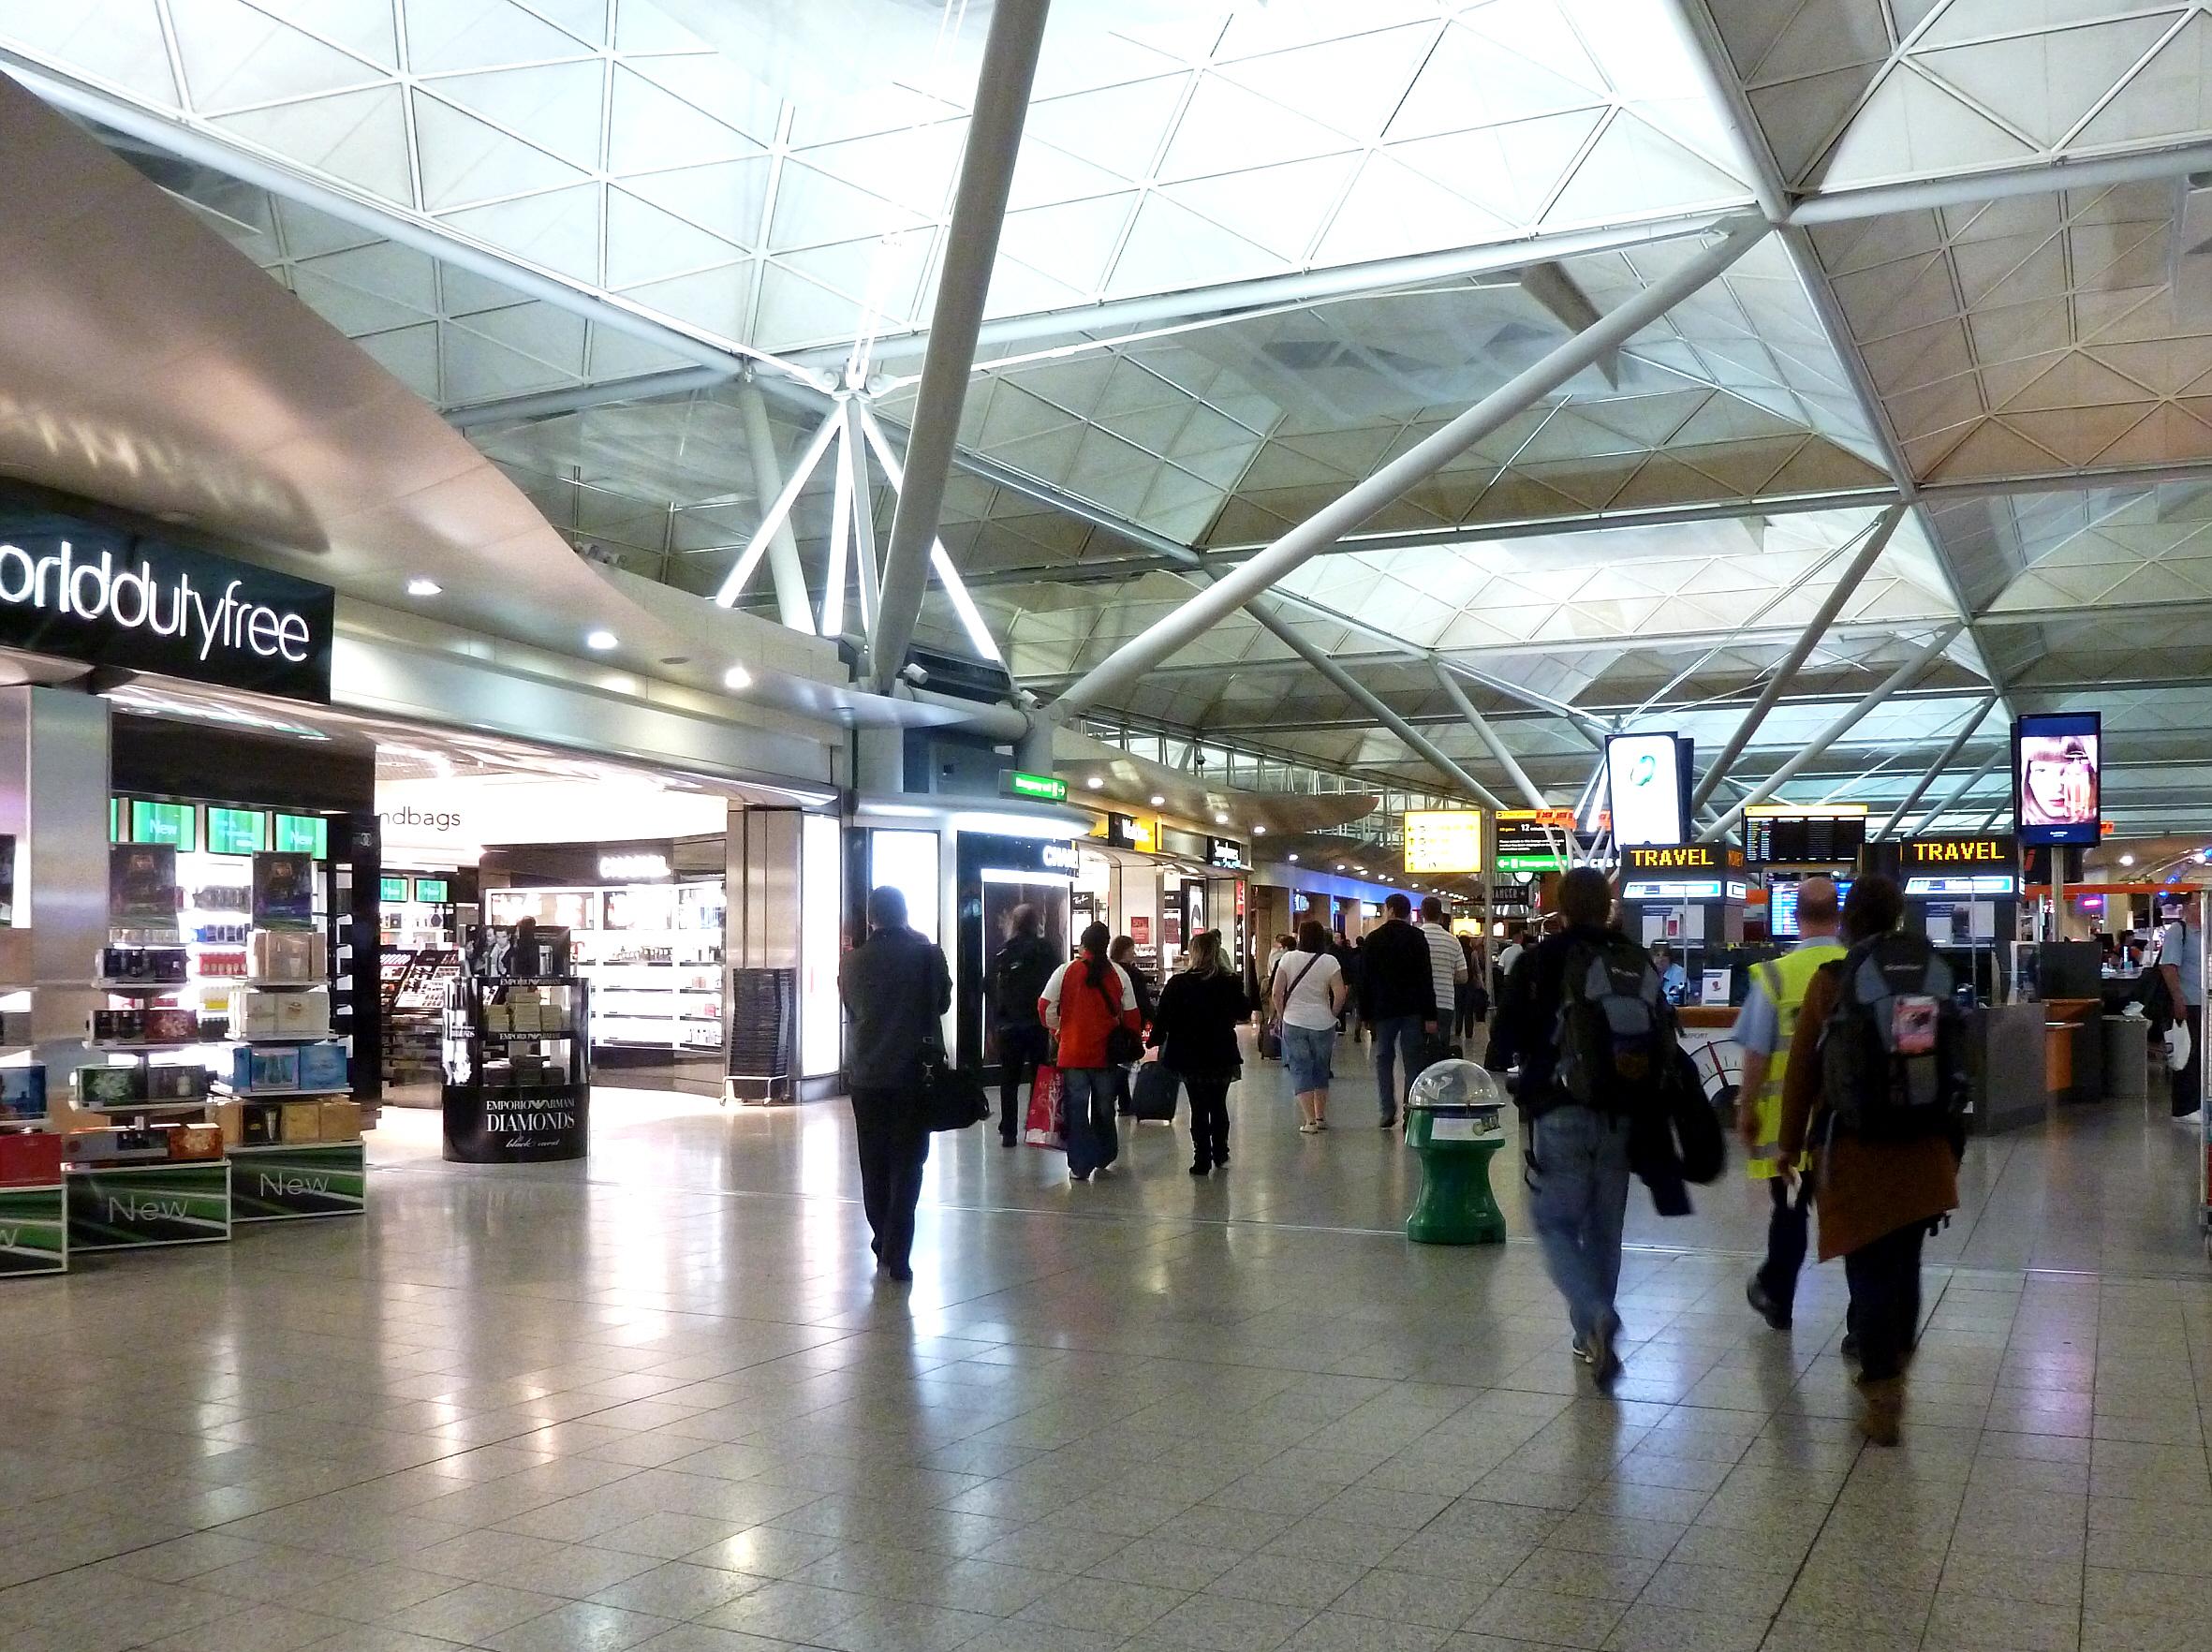 London Heathrow Duty Free